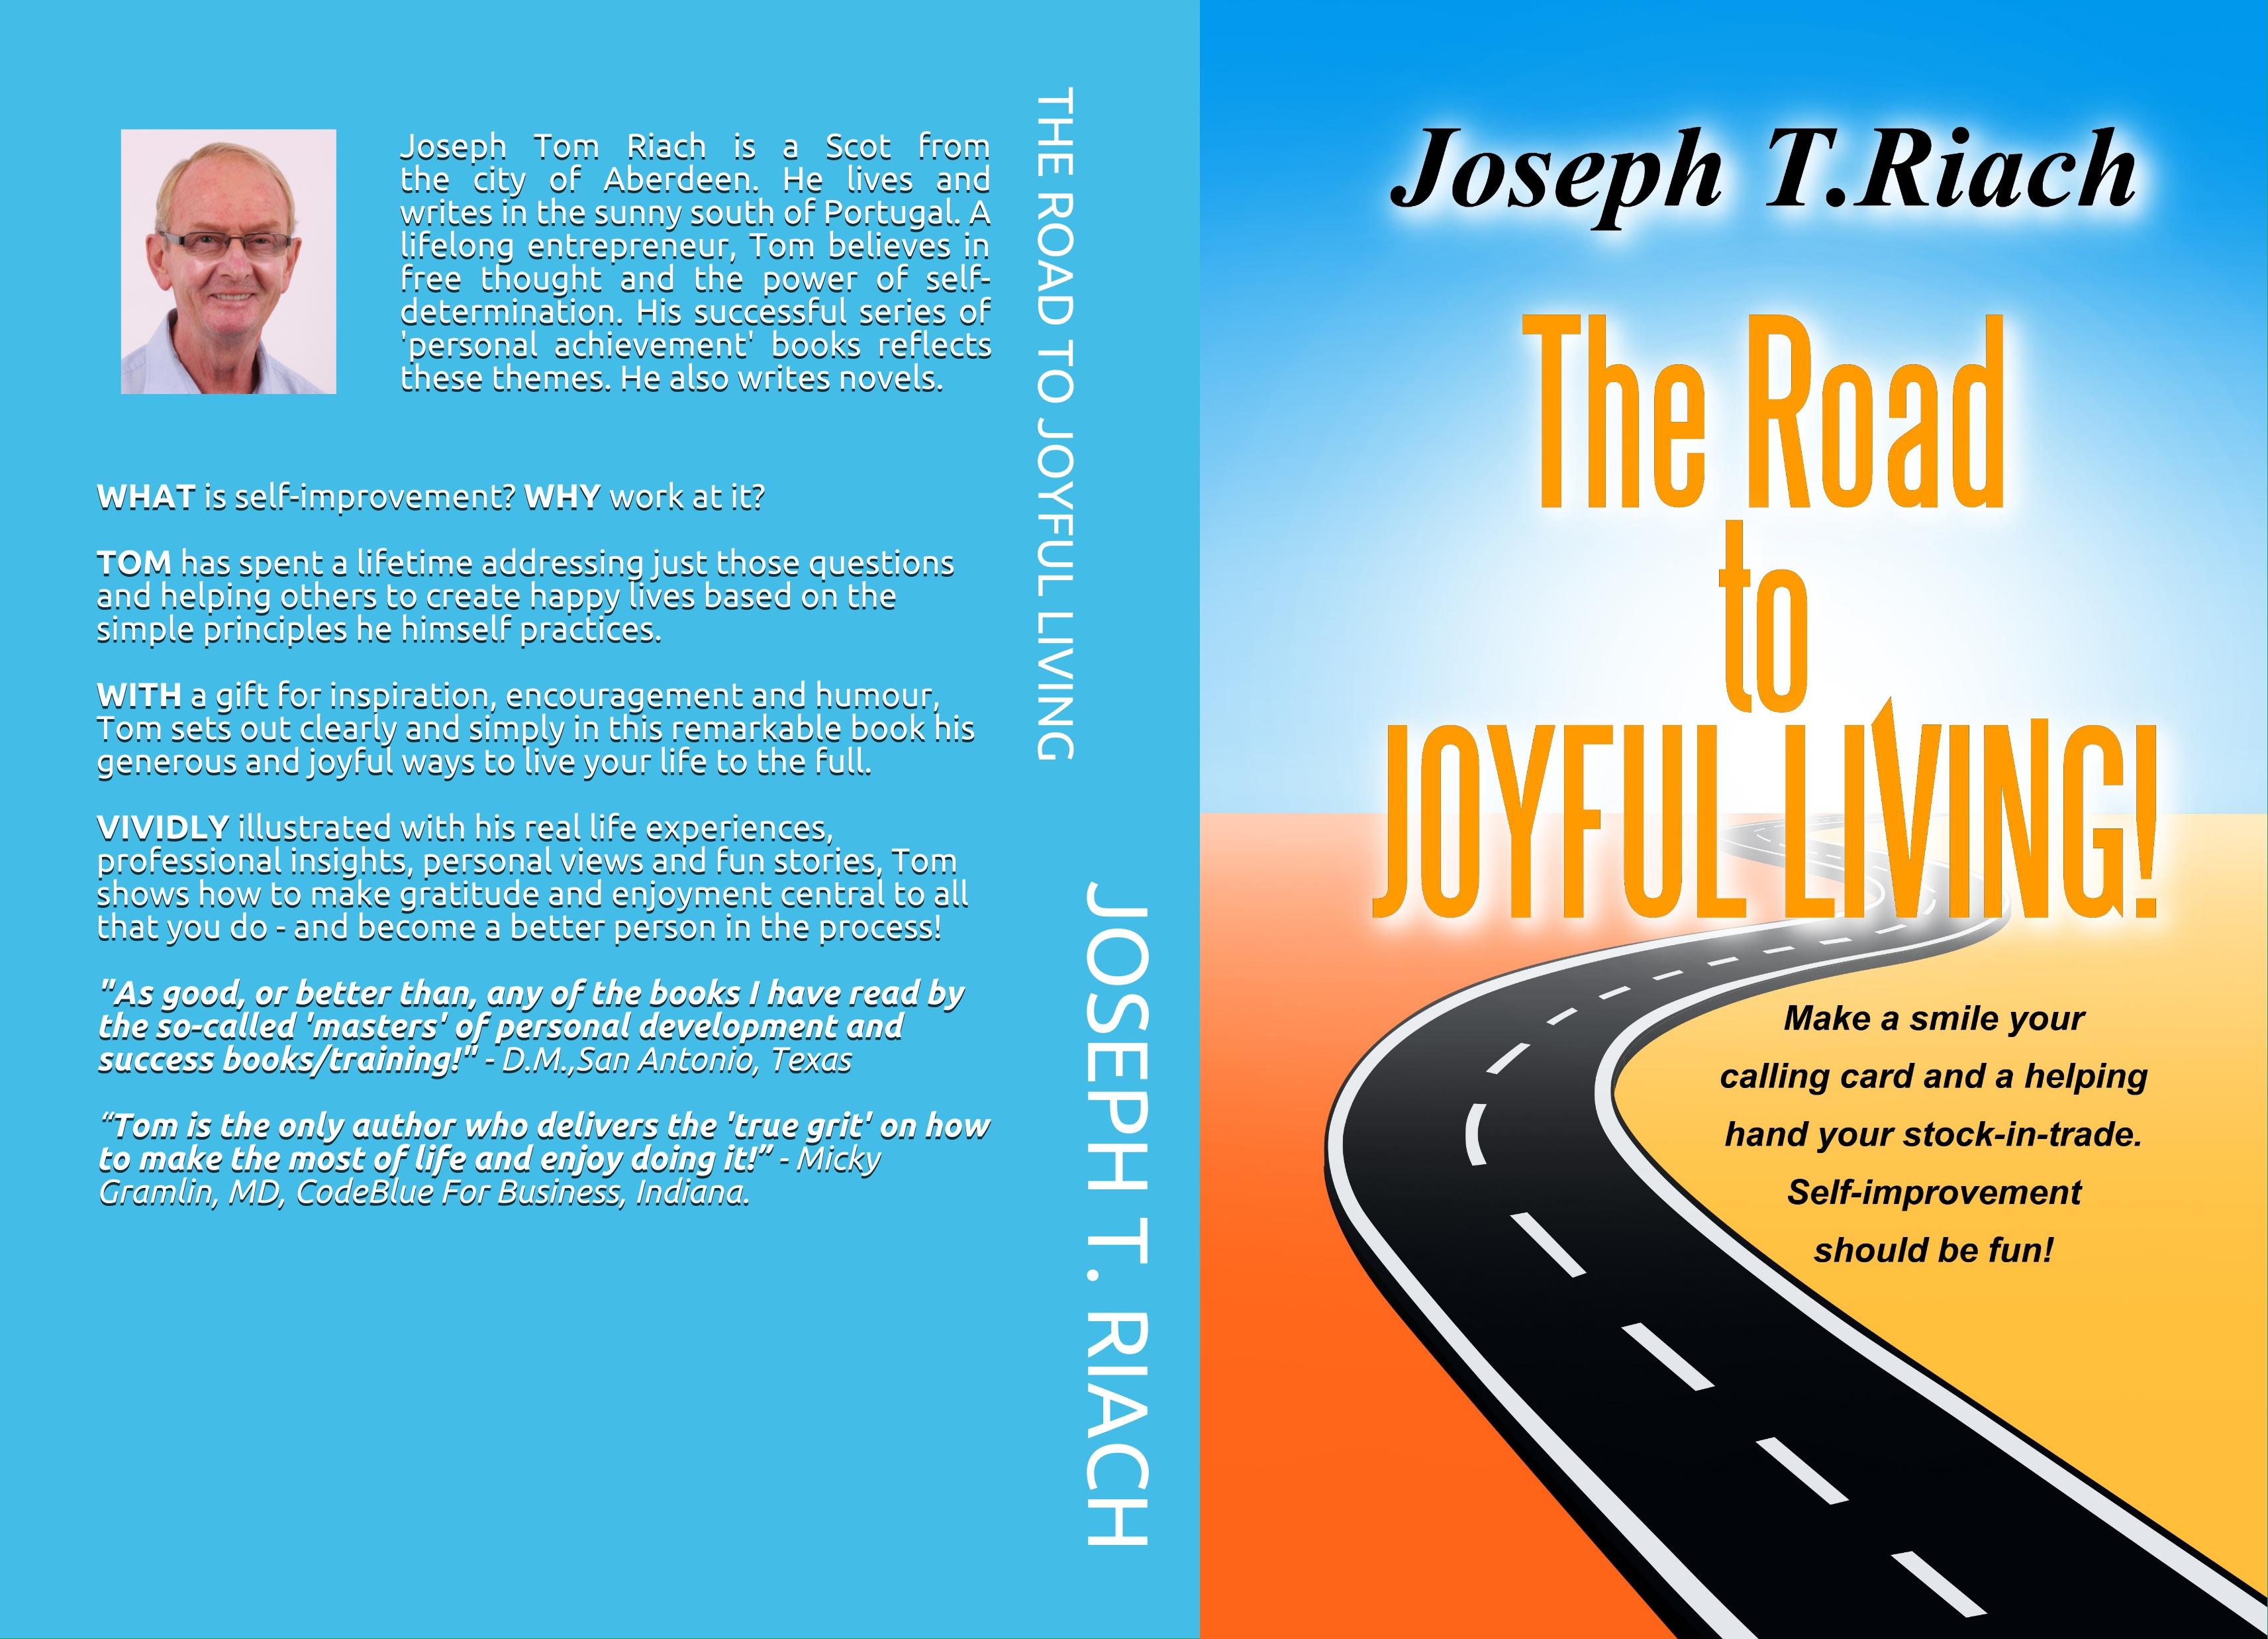 Joseph Tom Riach, Author – Paperbacks and Ebooks for sale on Amazon